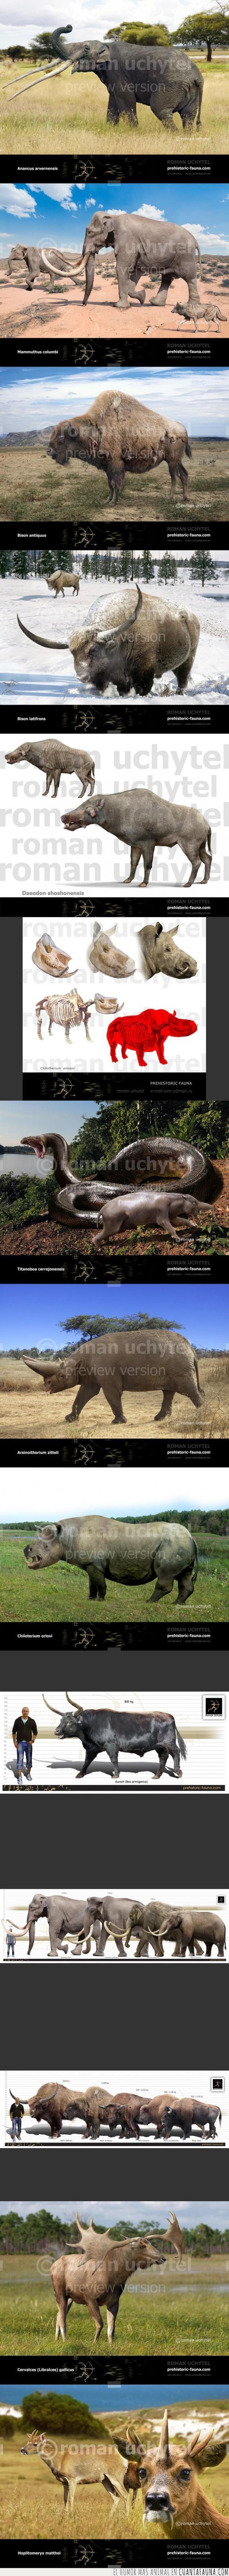 Animal,Ciervo,Elefante,Fauna,Prehistoria,Prehistorica,Primitiva,Toro,Vaca